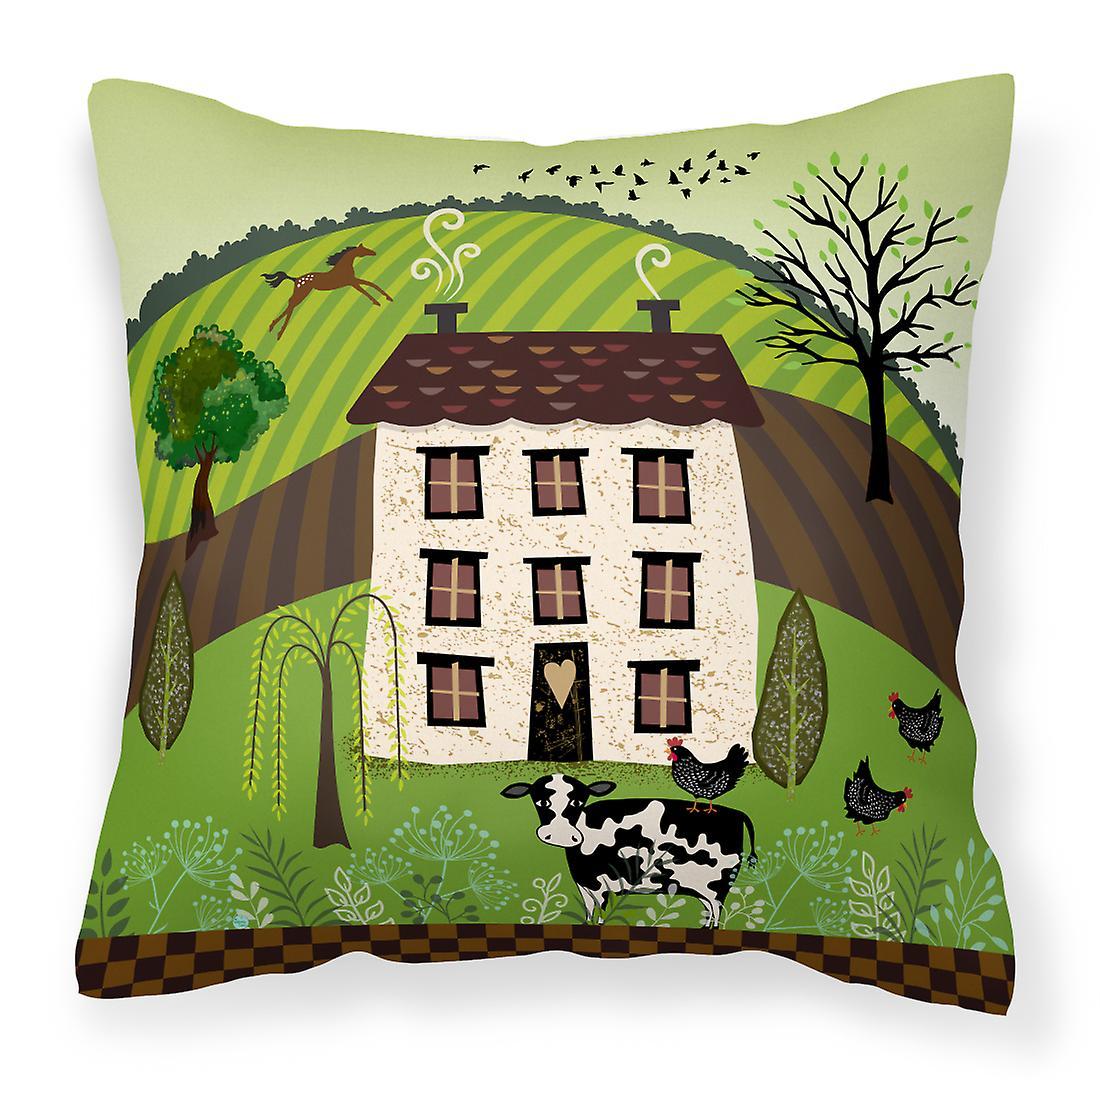 Décoratif Country Art Oreiller House Tissu Folk uZiOPkX